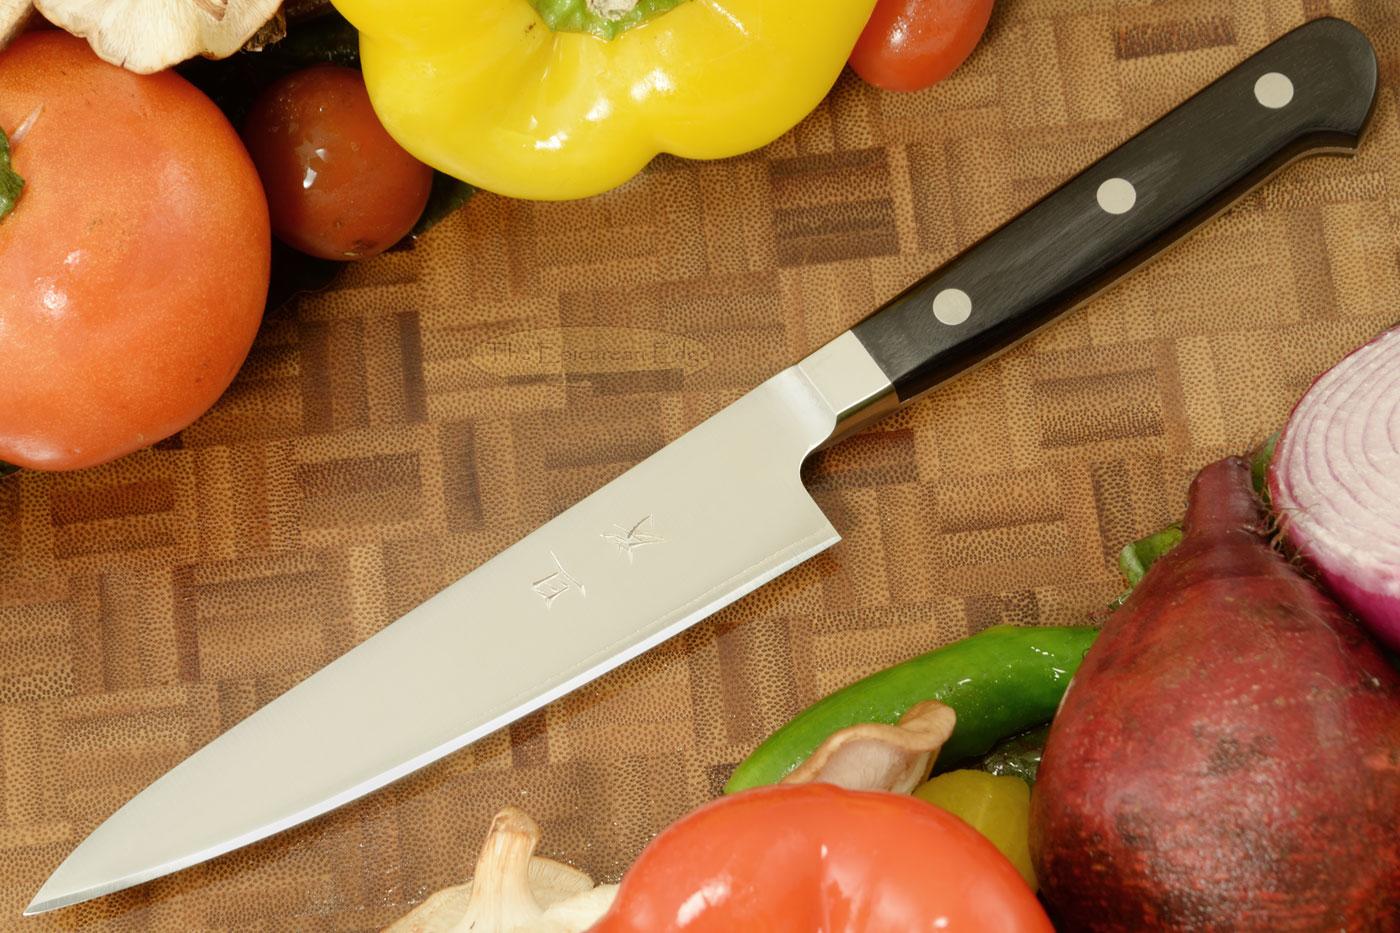 Akifusa Utility Knife - Fruit Knife - 5 1/4 in. (135mm)